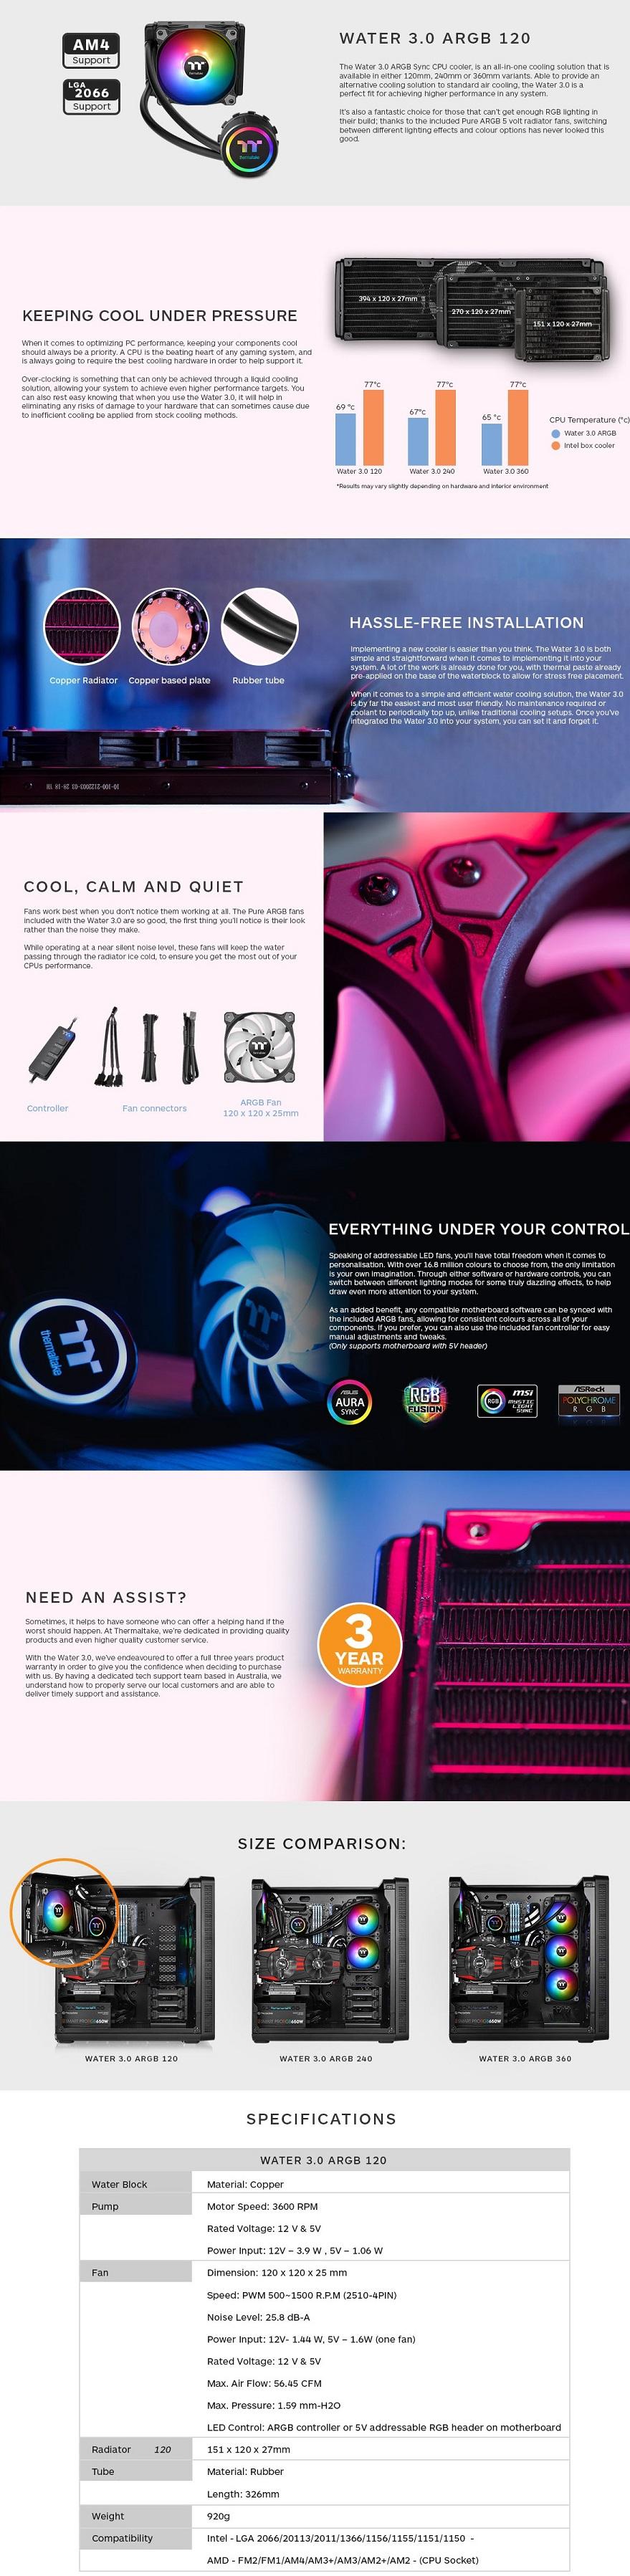 Thermaltake Water 3 0 120mm ARGB Sync AIO CPU Cooler